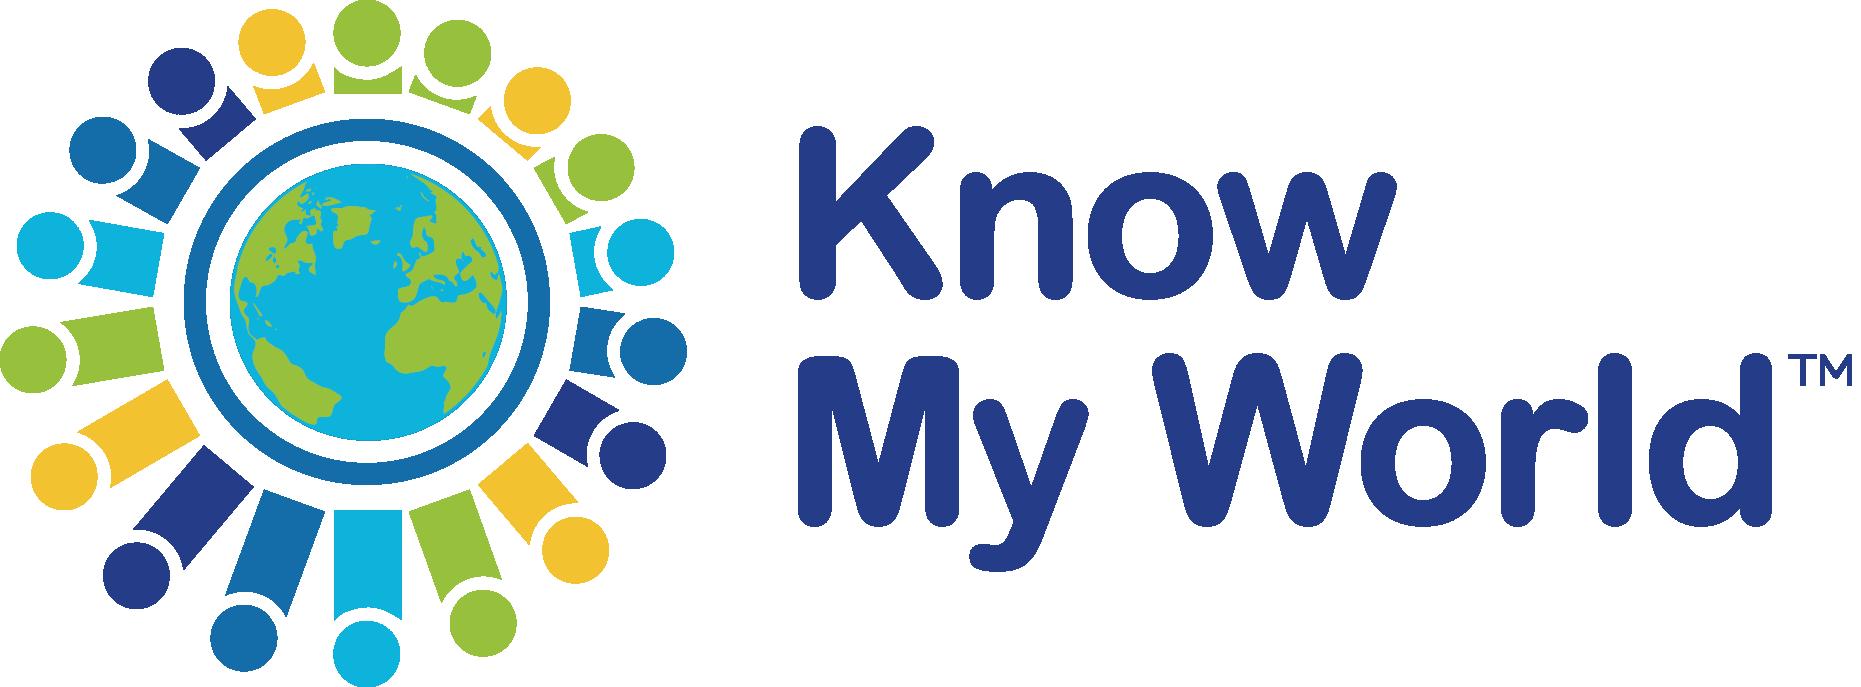 Know my teachers guide. Clipart world world logo